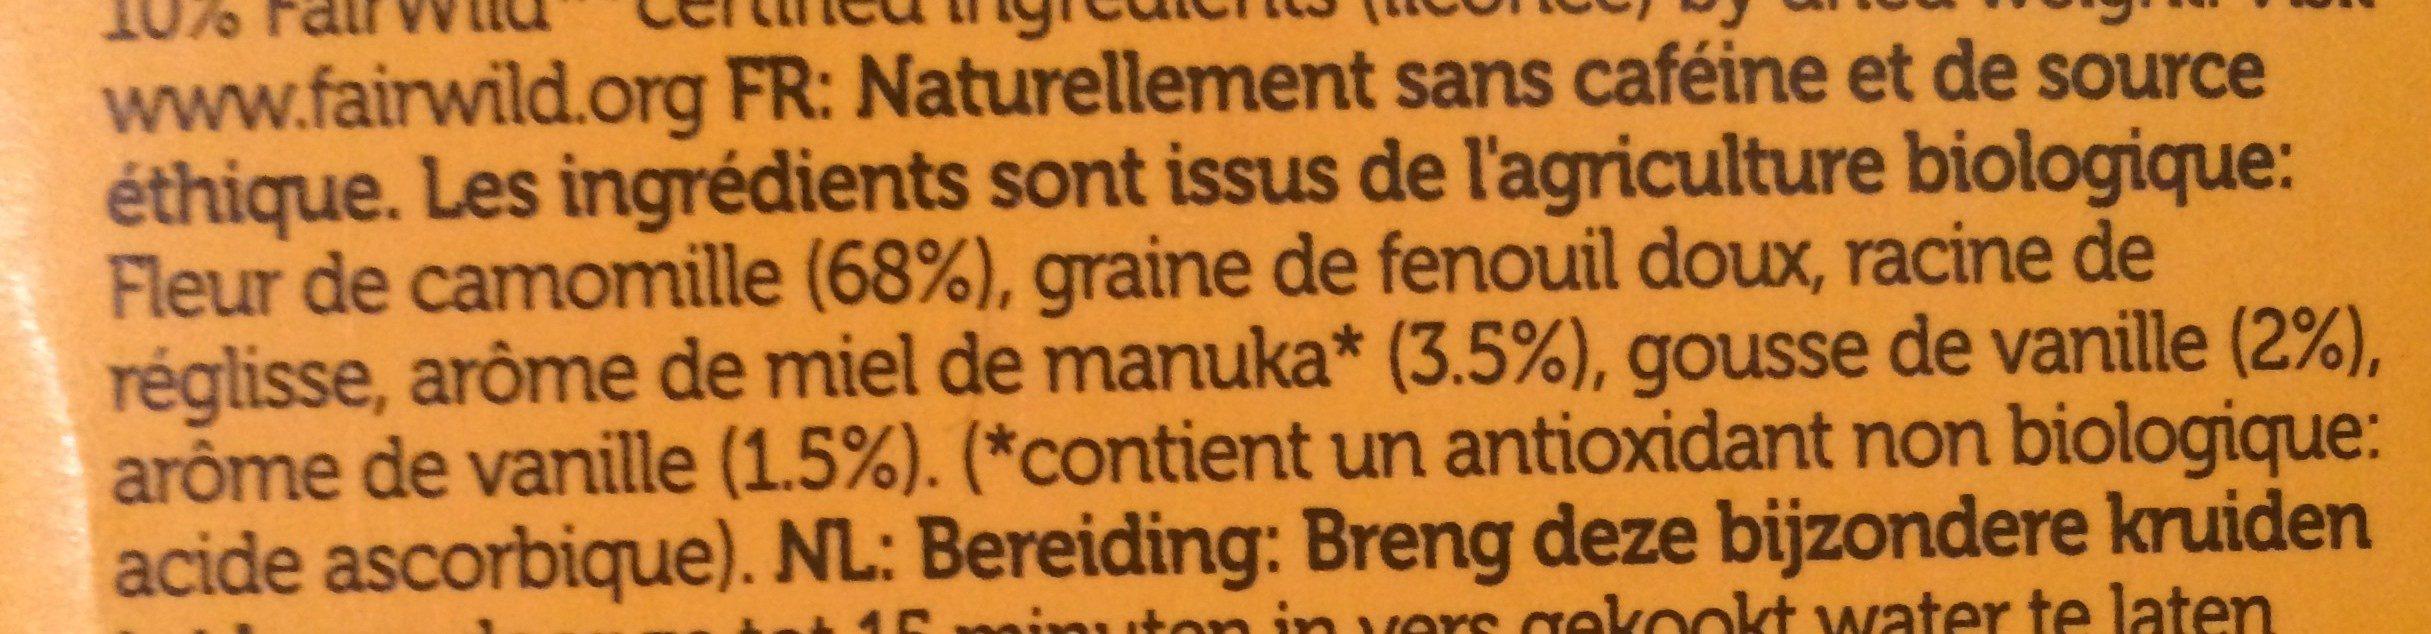 Infusion Camomille Vanille Miel De Manuka Bio - Pukka - Ingrediënten - fr